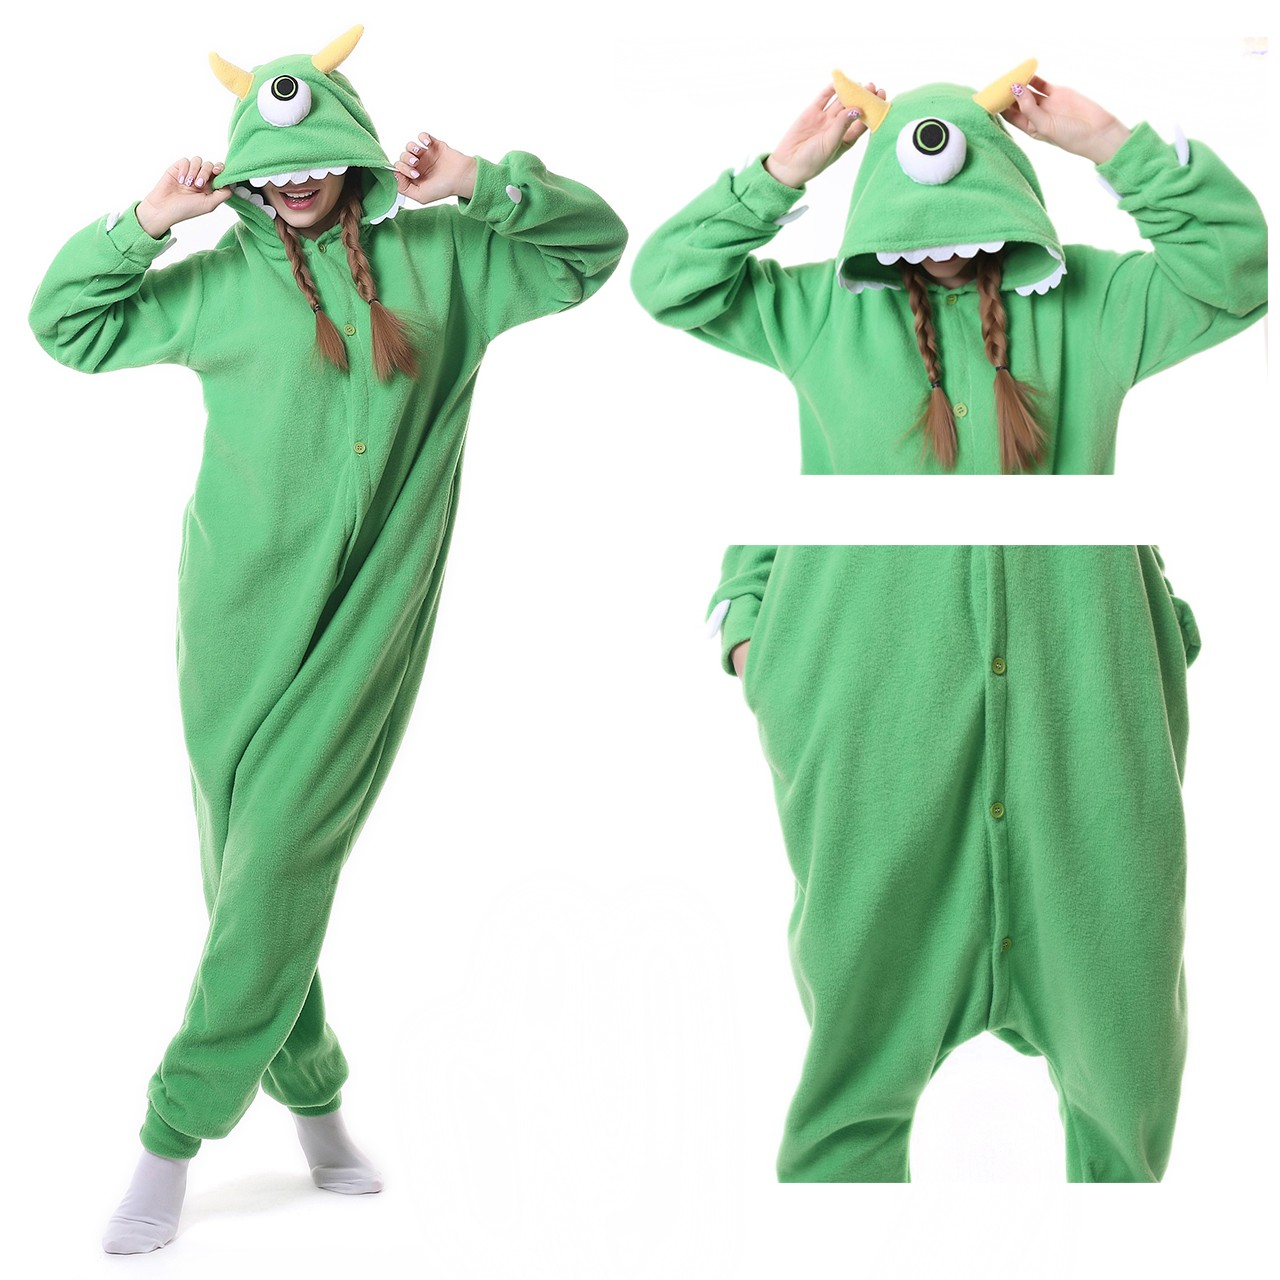 c28083eb612a One Eyed Monster Disney Onesie Kigurumi Cartoon Pajama for adult Monsters  Inc Costumes